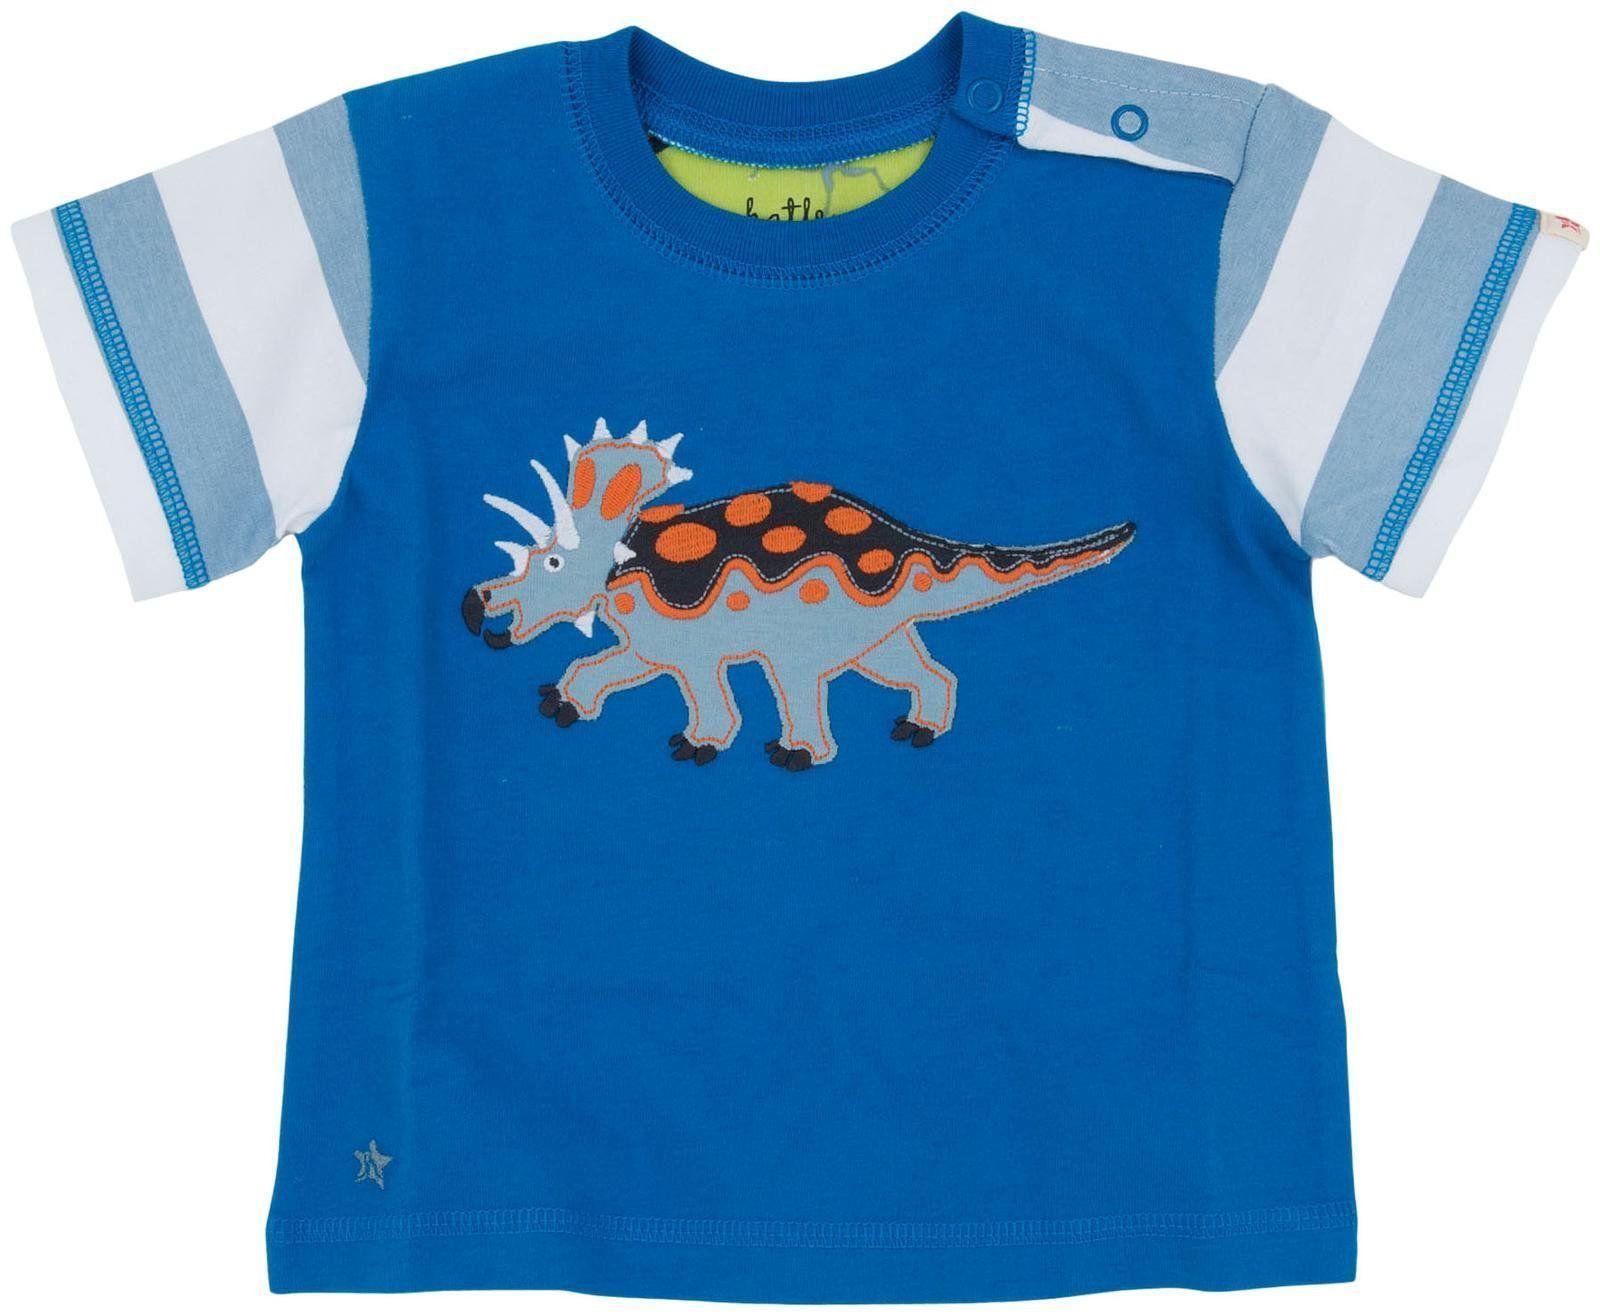 Hatley Baby Boys Short Sleeve Graphic Tees T-Shirt